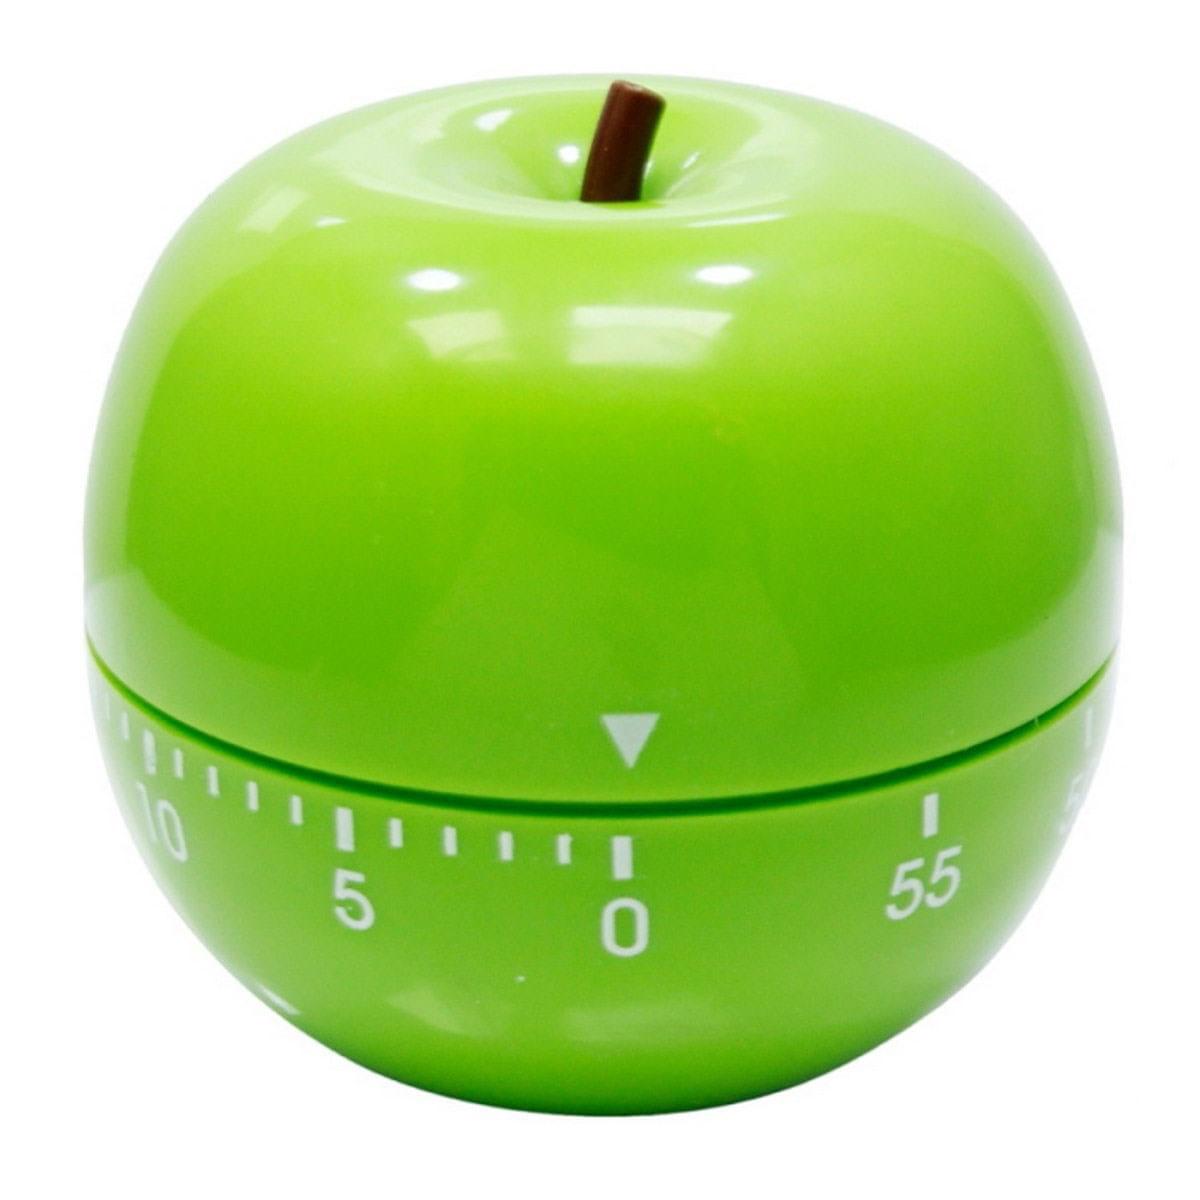 60 Minute Timer Apple Shape